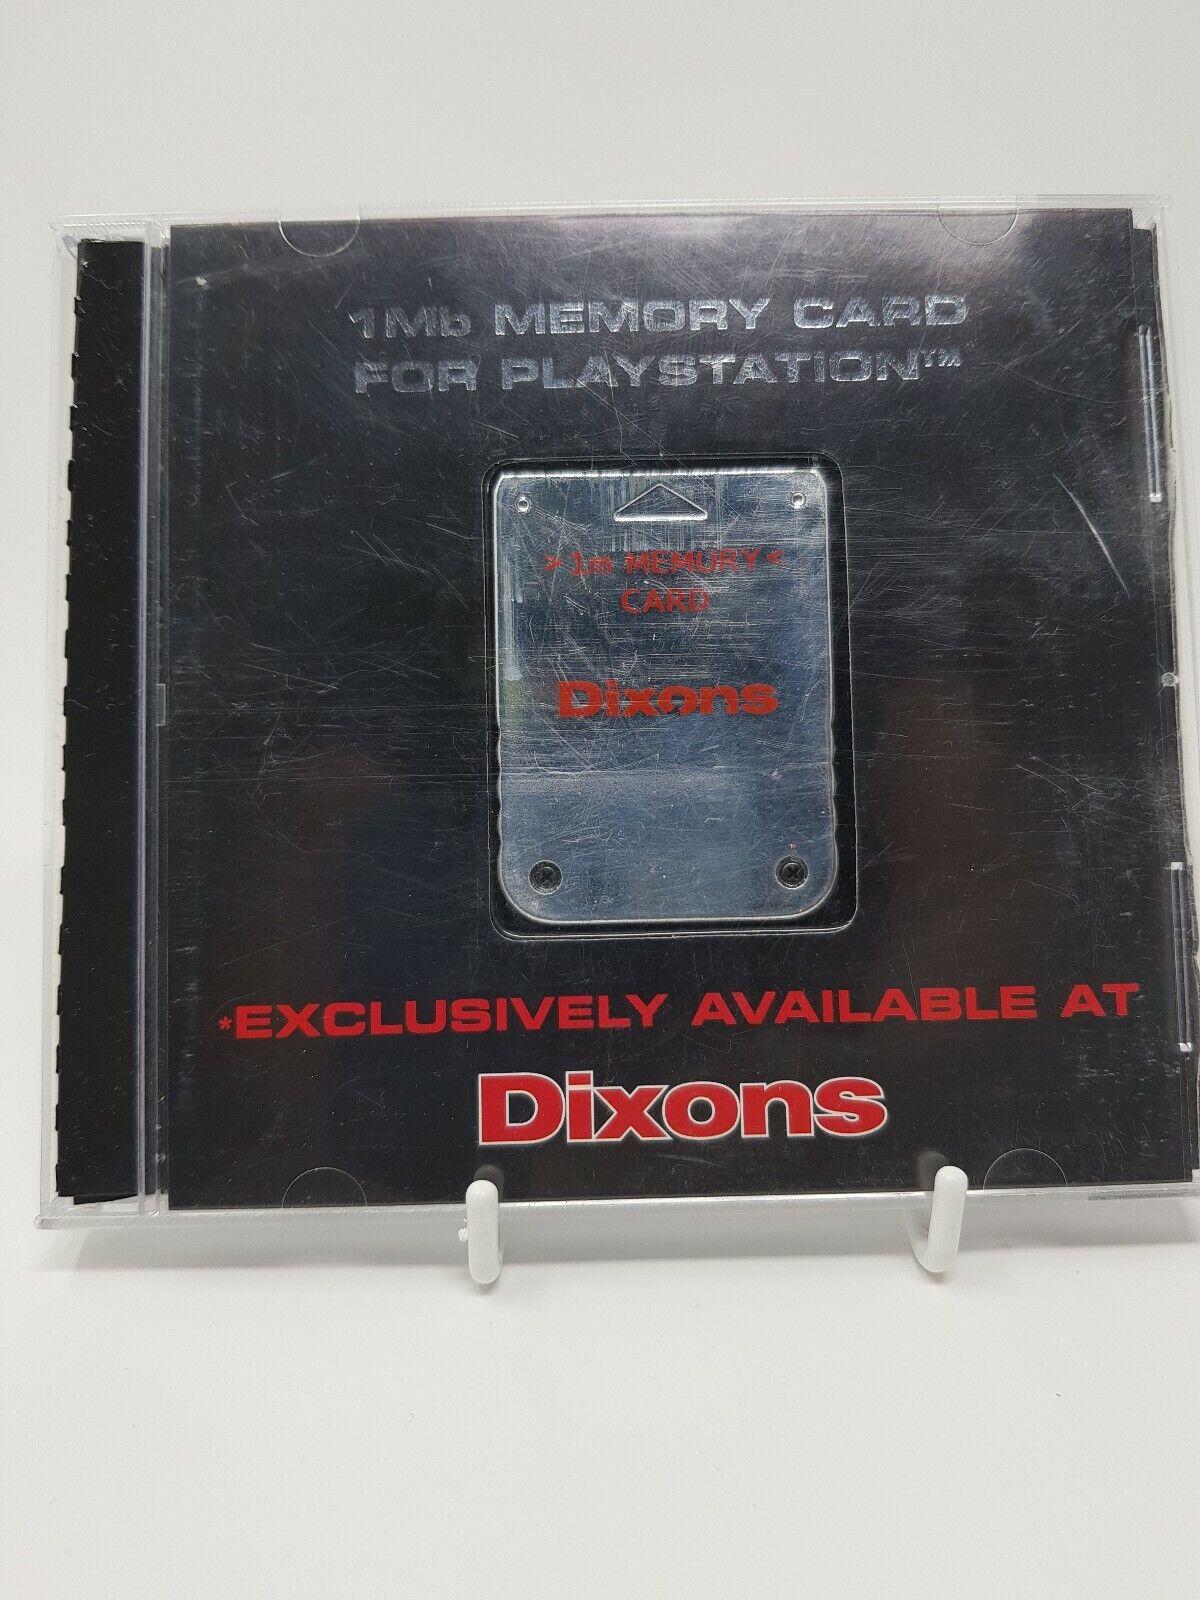 Dixons Platinum Sony PlayStation 1/PS1 1Mb Memory Card Boxed Retro GC PS2 compat